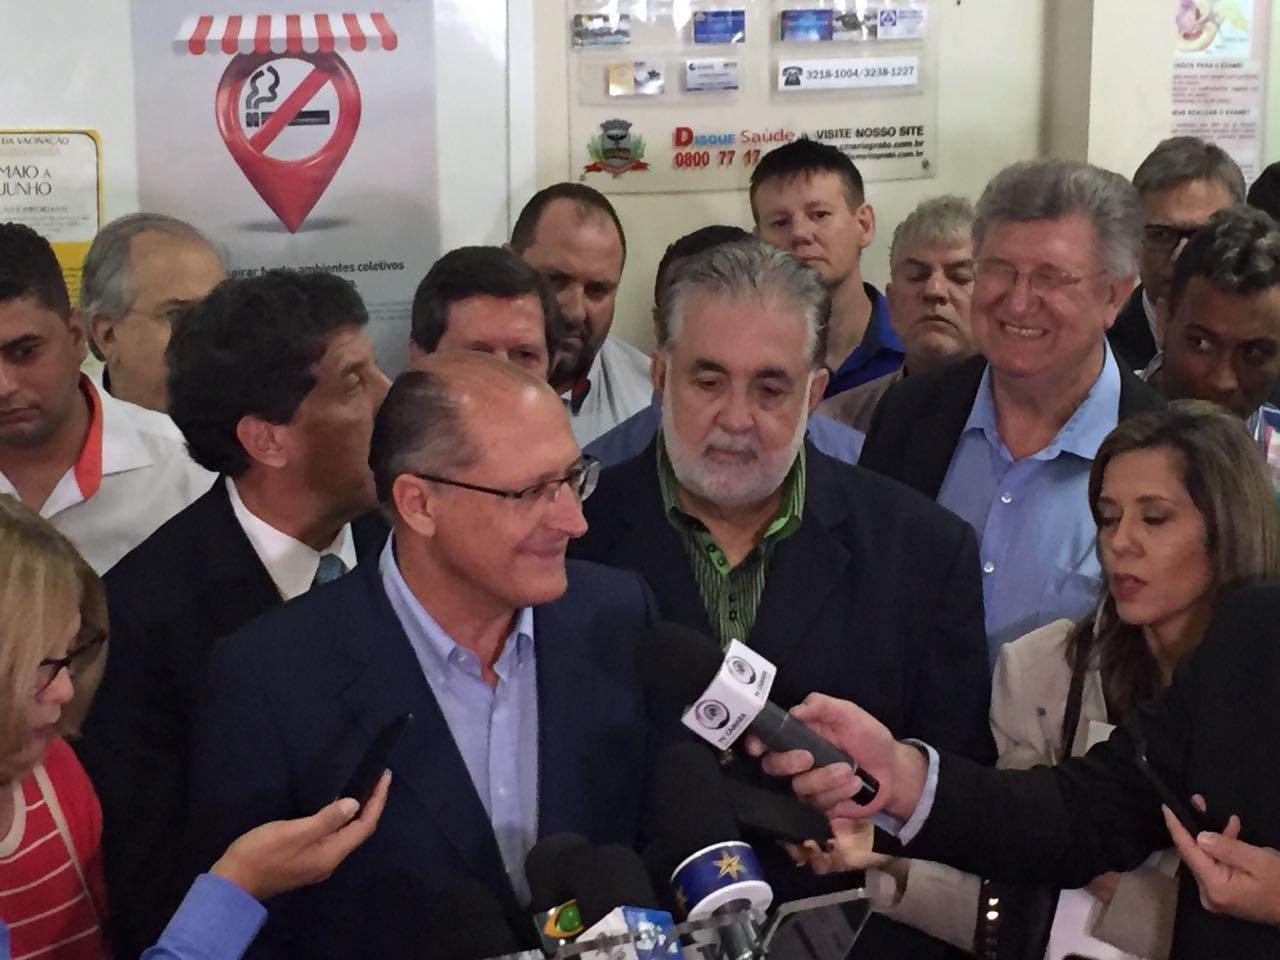 Bolçone e o governador Alckmin<a style='float:right' href='https://www3.al.sp.gov.br/repositorio/noticia/N-06-2016/fg191946.jpg' target=_blank><img src='/_img/material-file-download-white.png' width='14px' alt='Clique para baixar a imagem'></a>